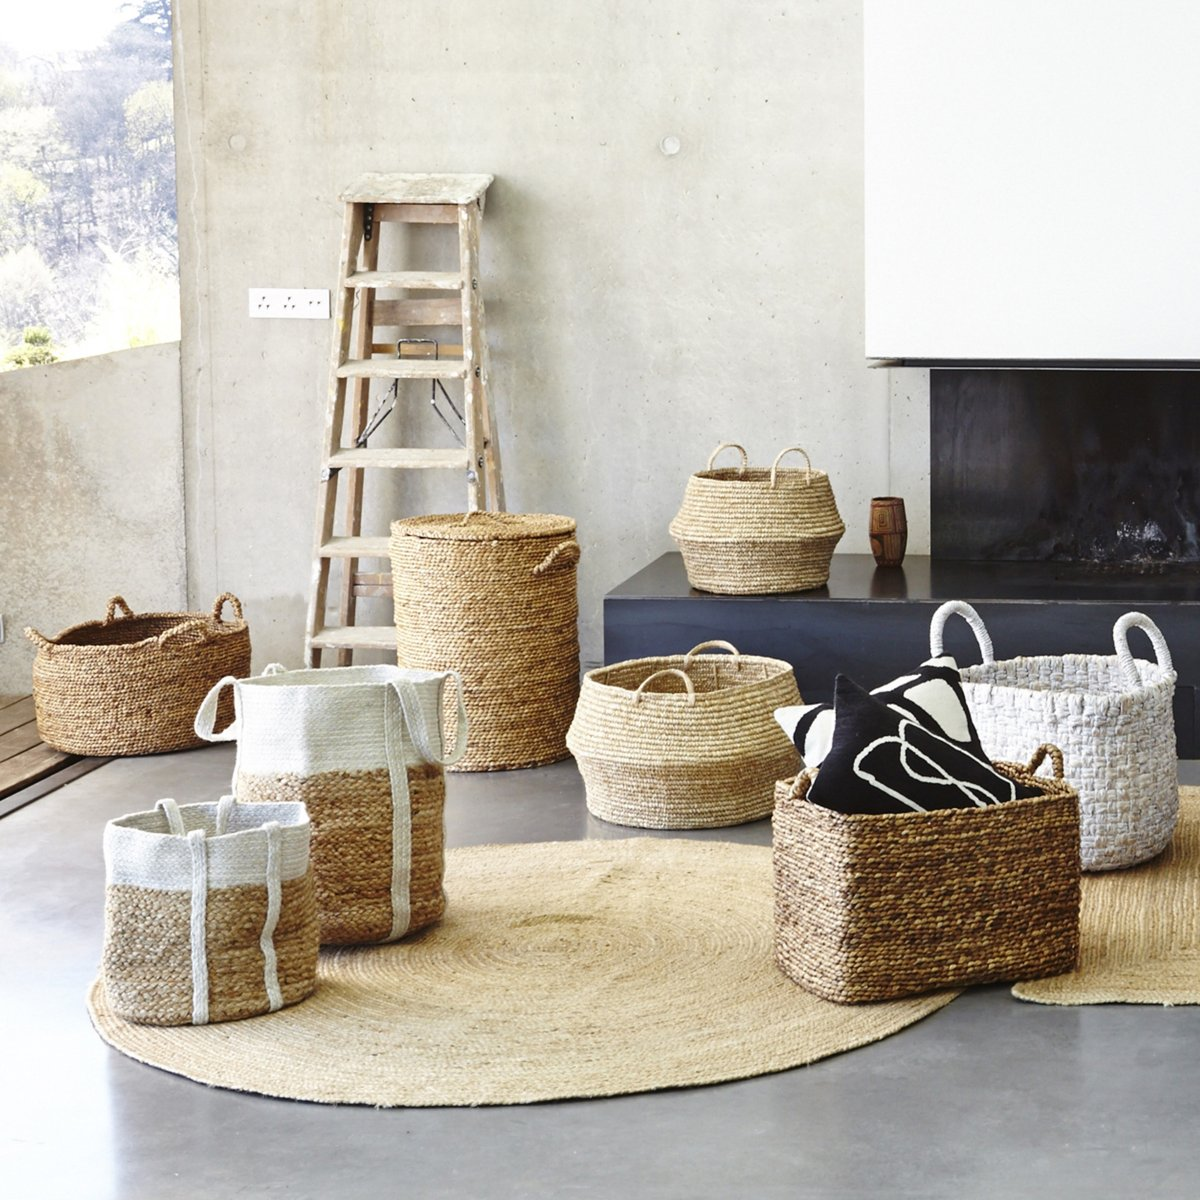 ampm coups de coeur printemps t 2016. Black Bedroom Furniture Sets. Home Design Ideas